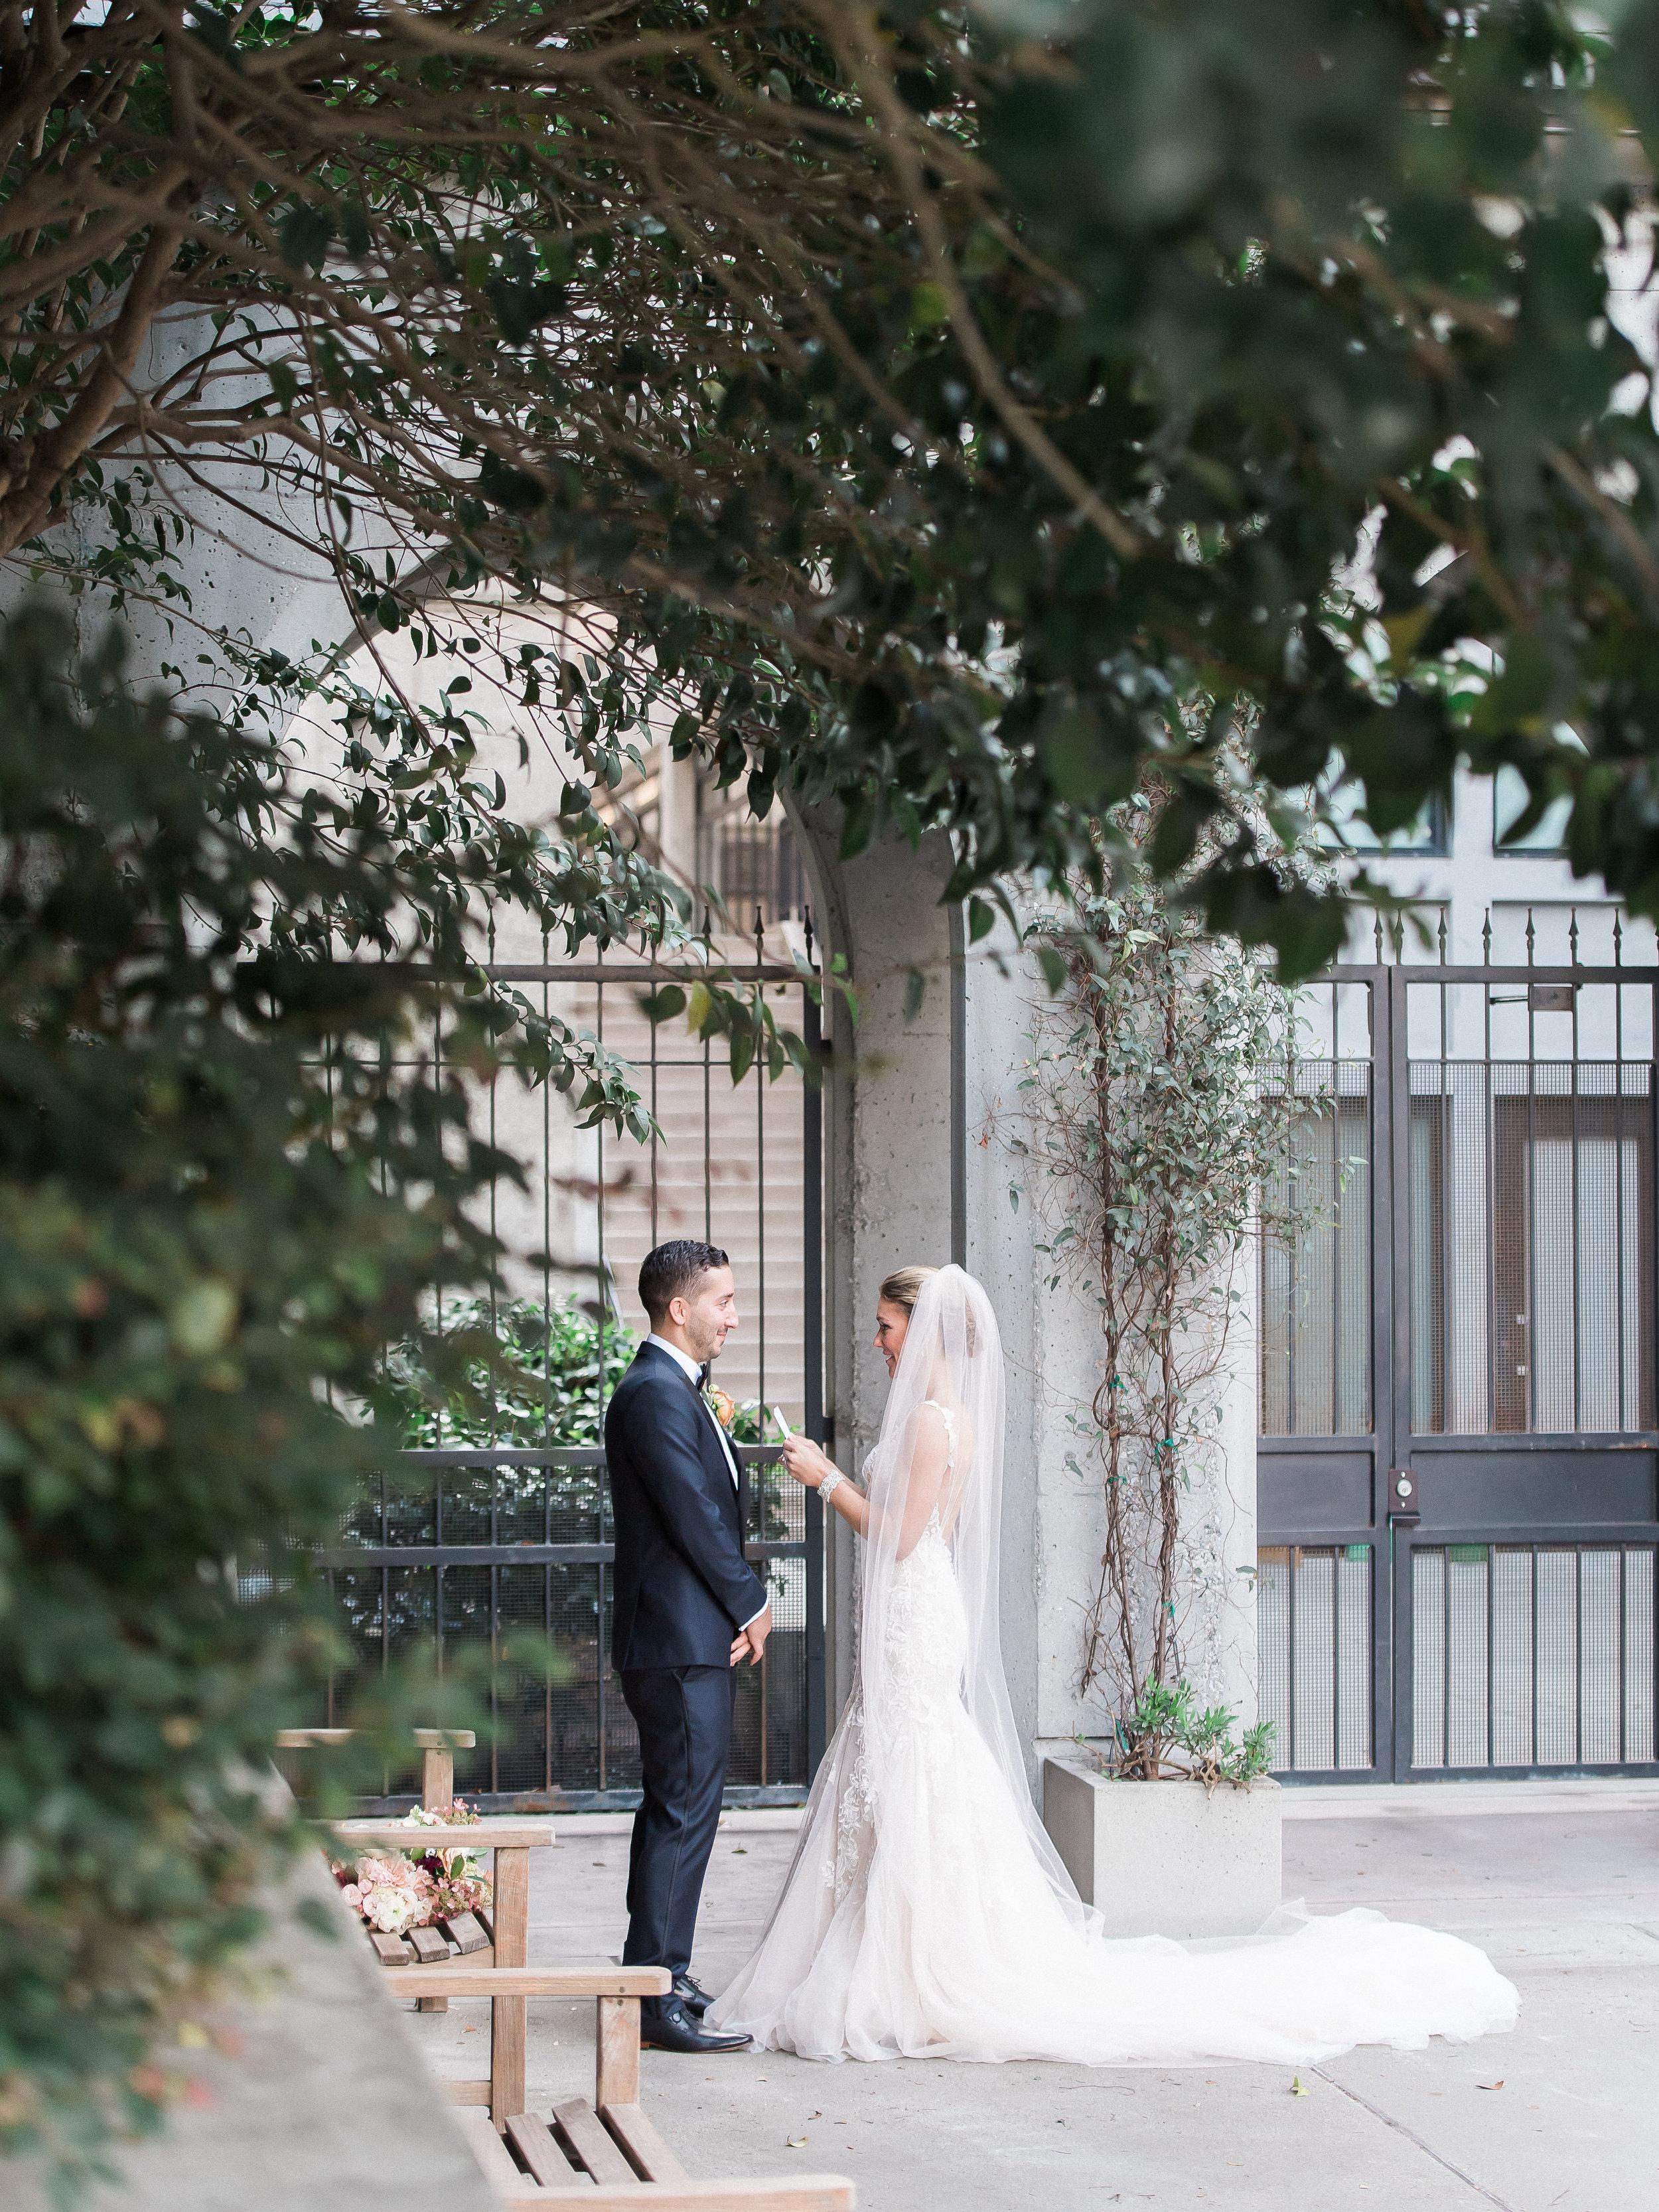 Katie+Nick_wedding_spp-blog-81.jpg